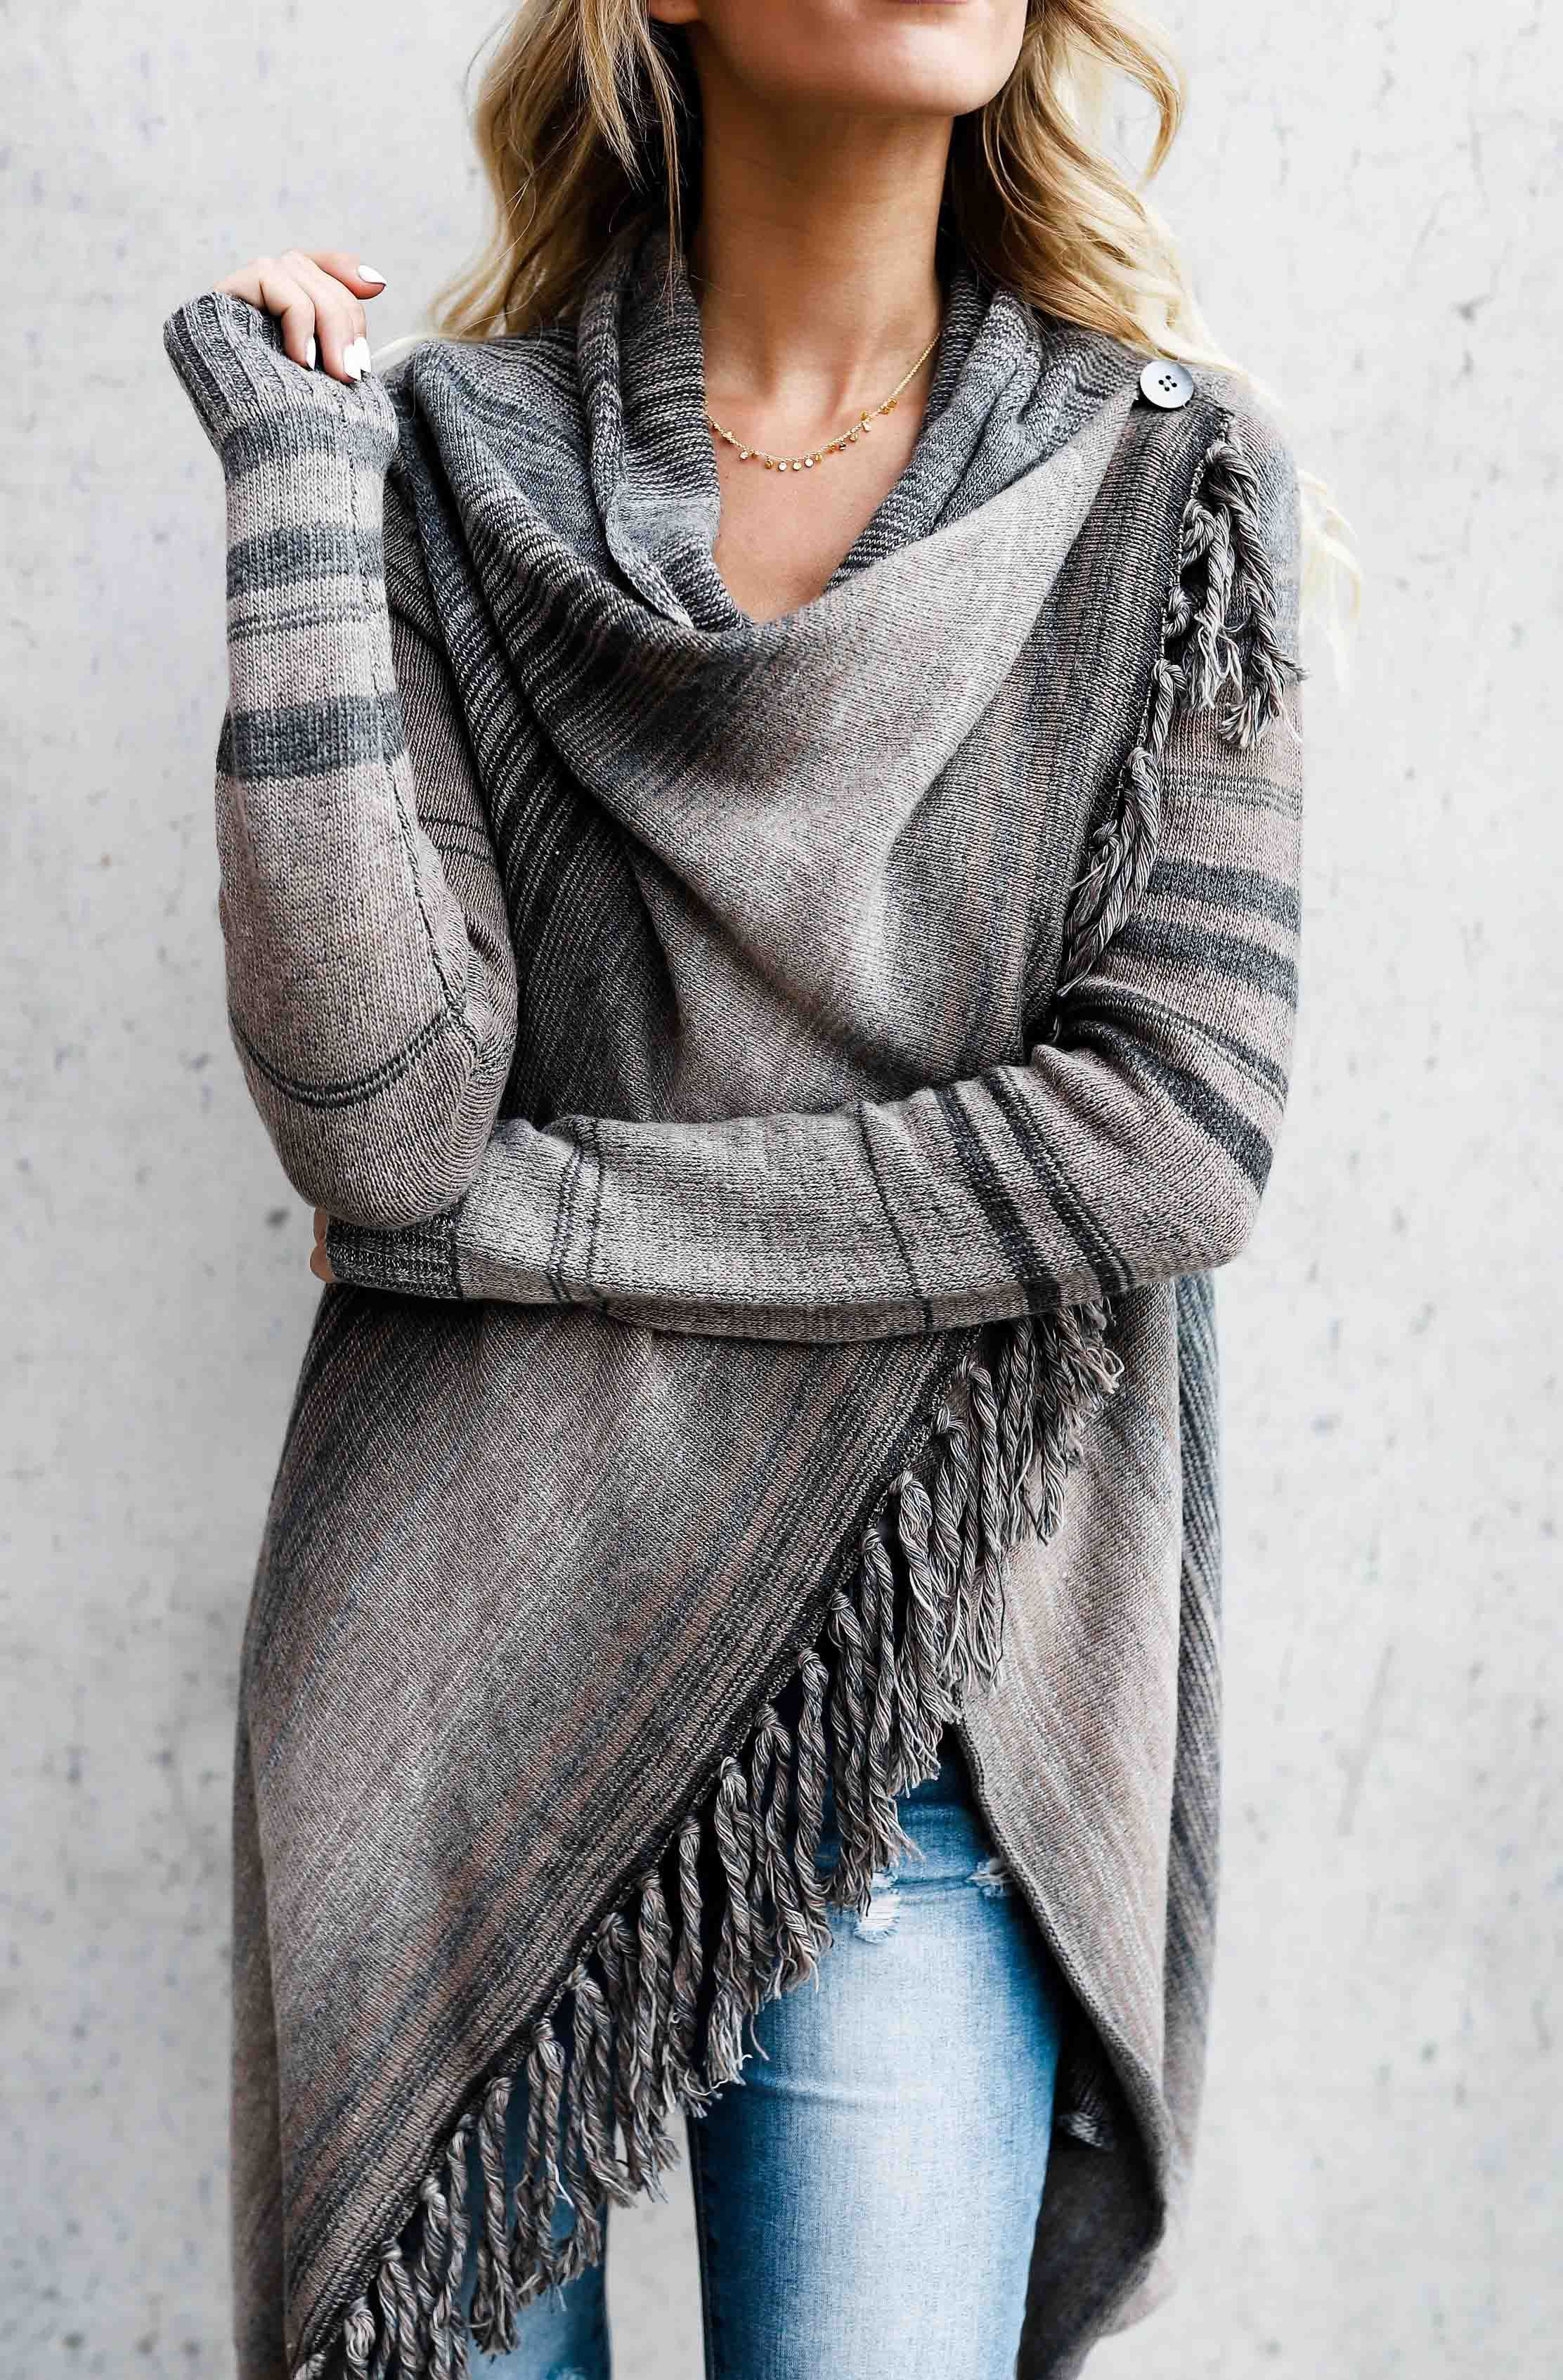 $47.99! Single Button Tassel Asymmetrical Hem Shawl Get ready for Fall fashion! Find fashionable outfits for the new season.